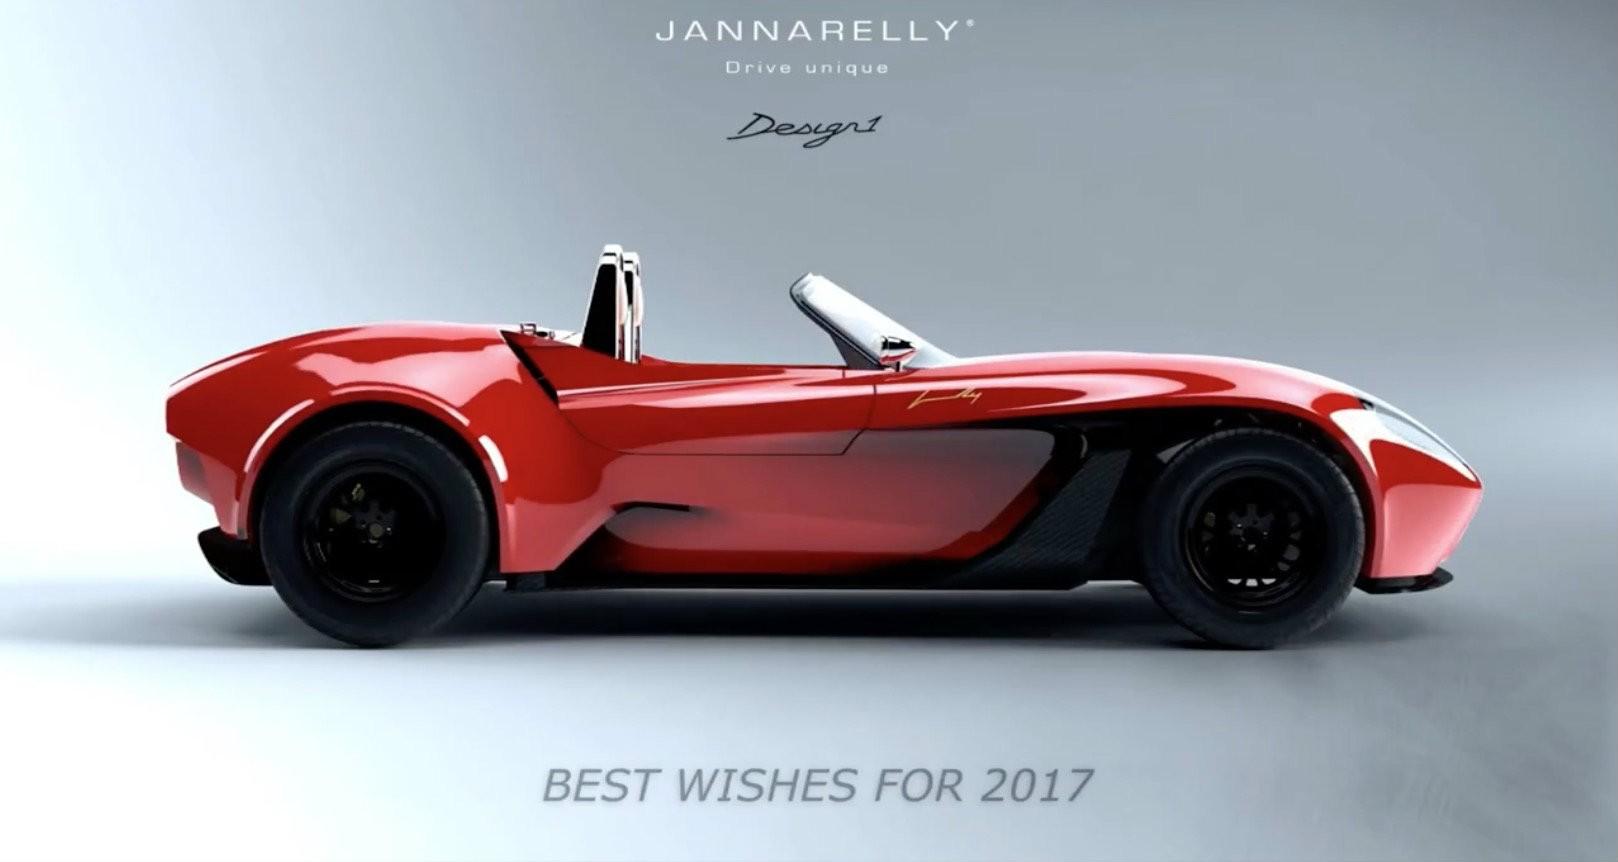 Janarelly Design-1 Coupé